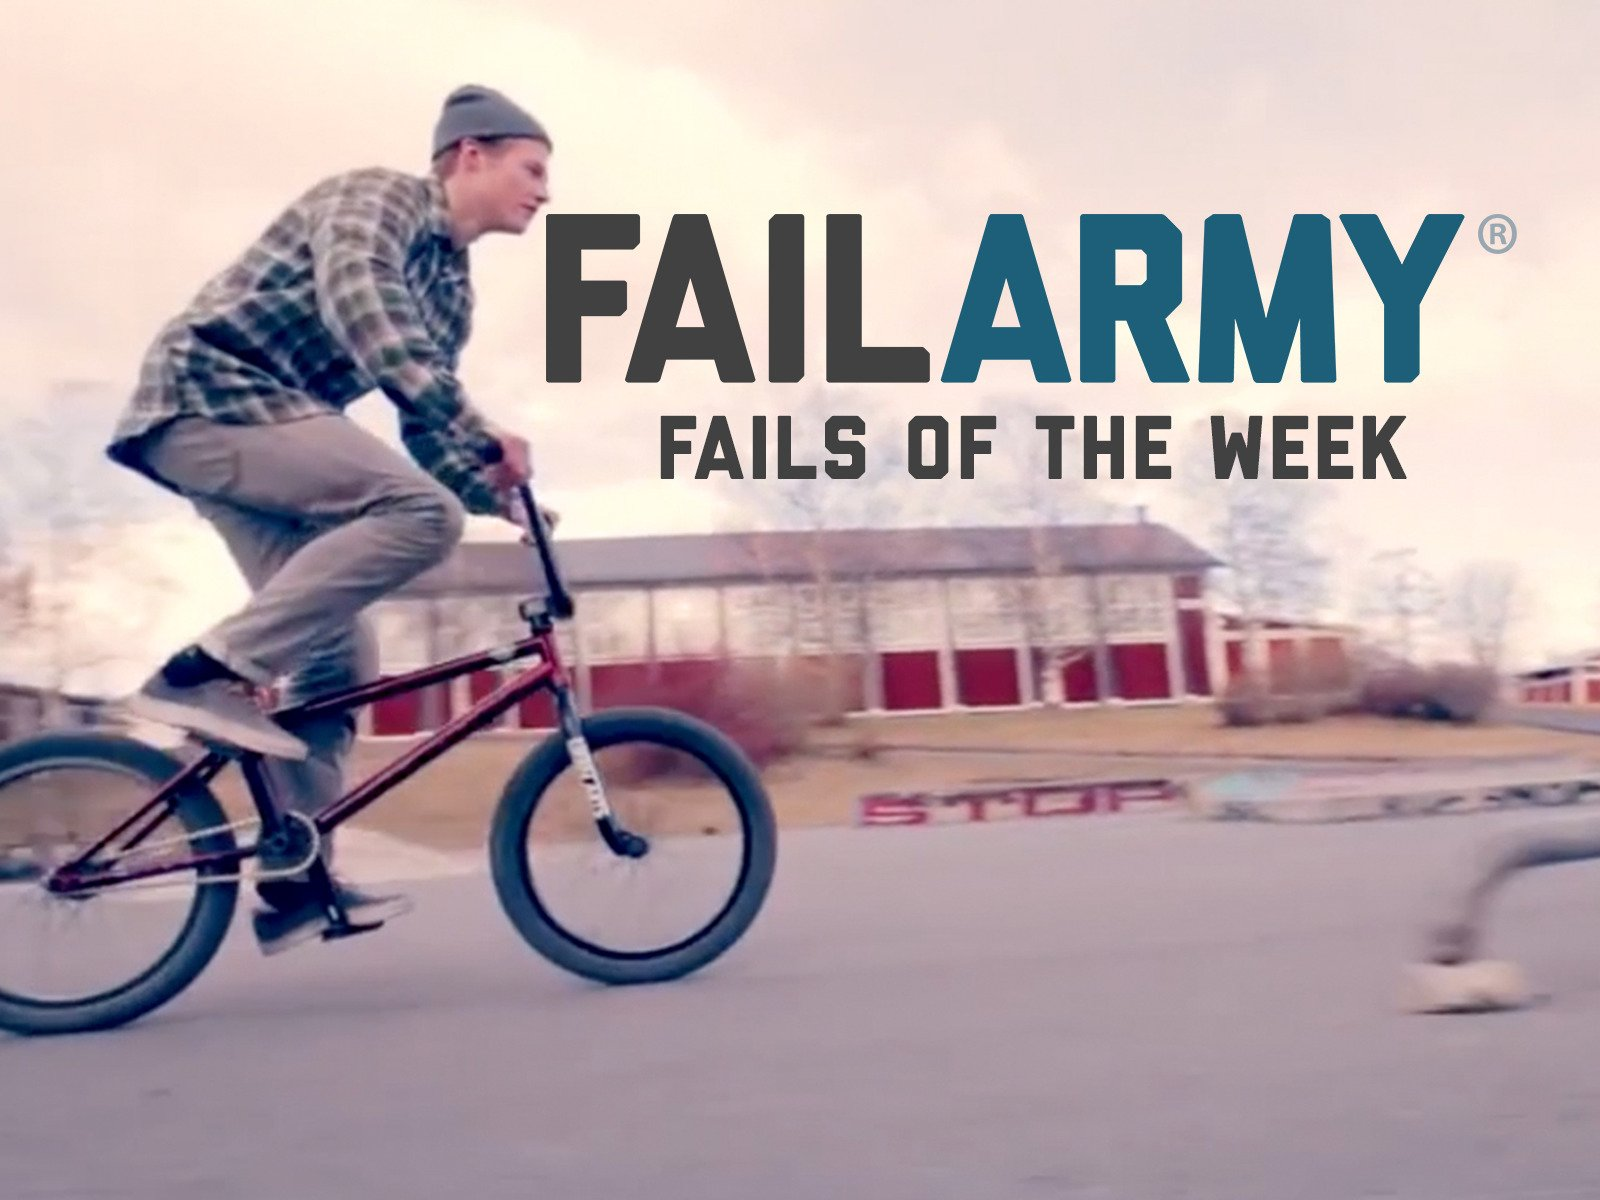 Clip: Fails of the Week - Season 1